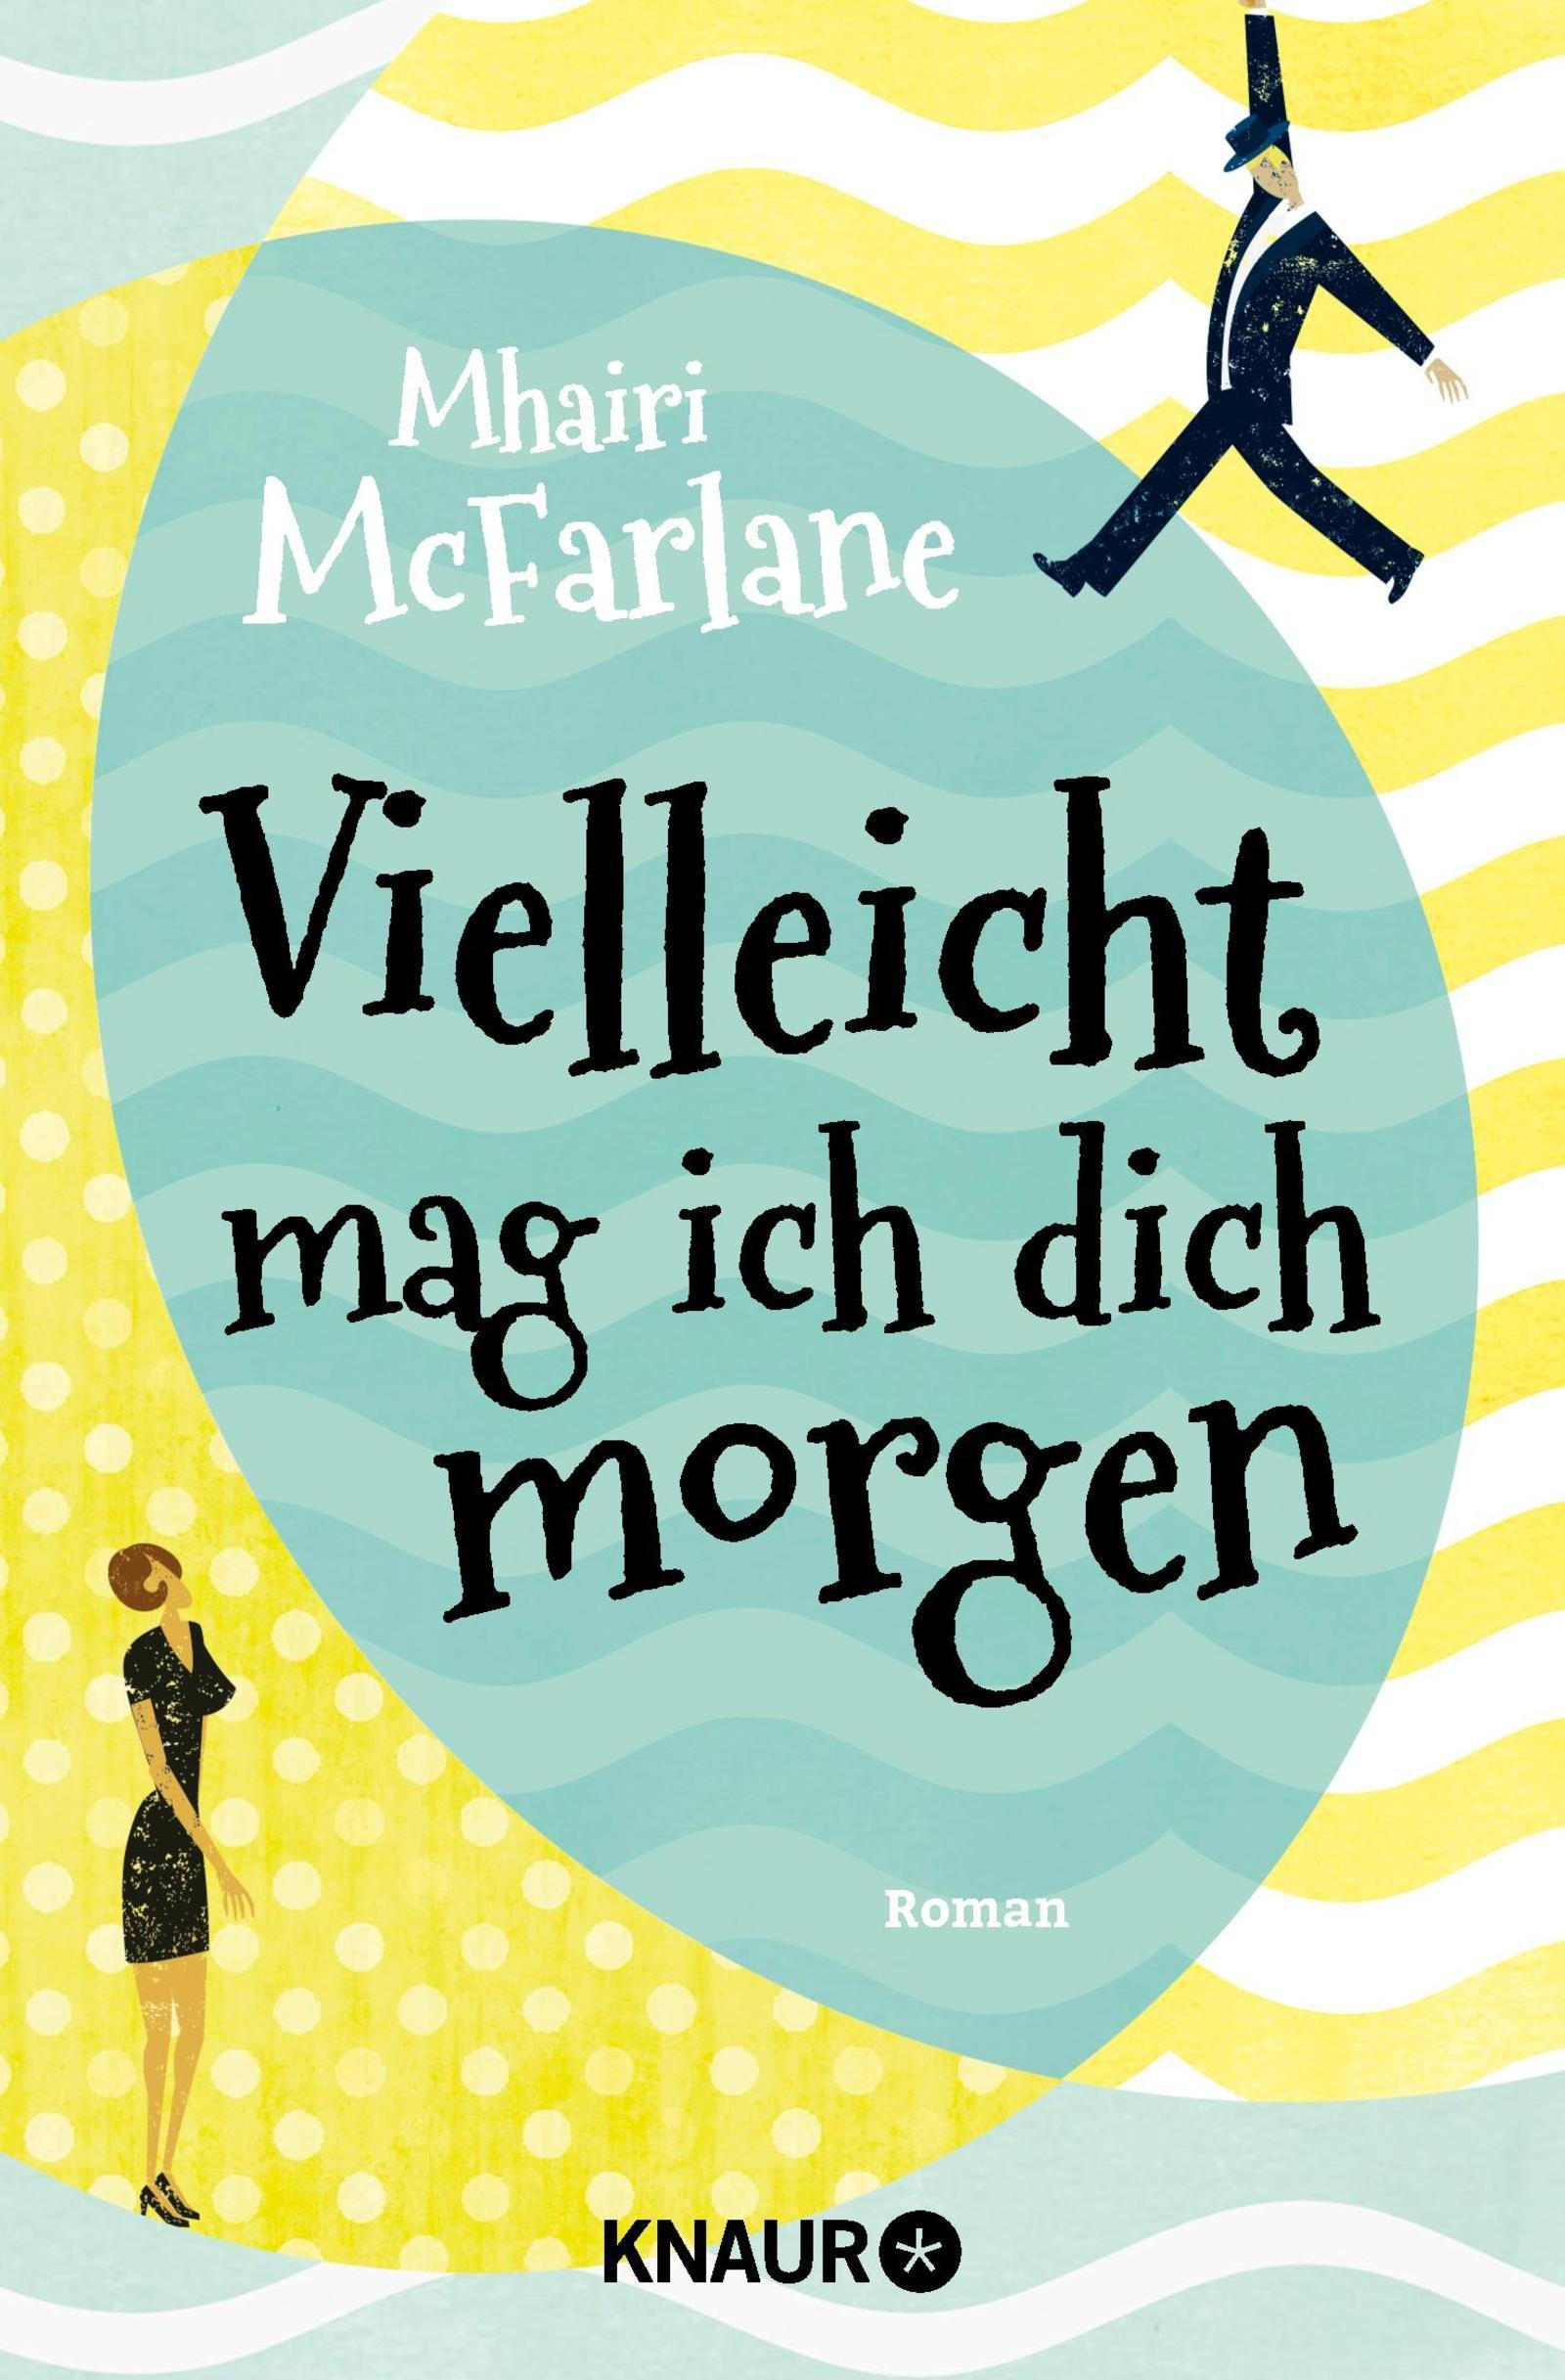 Mhairi McFarlane: Vielleicht mag ich dich morgen